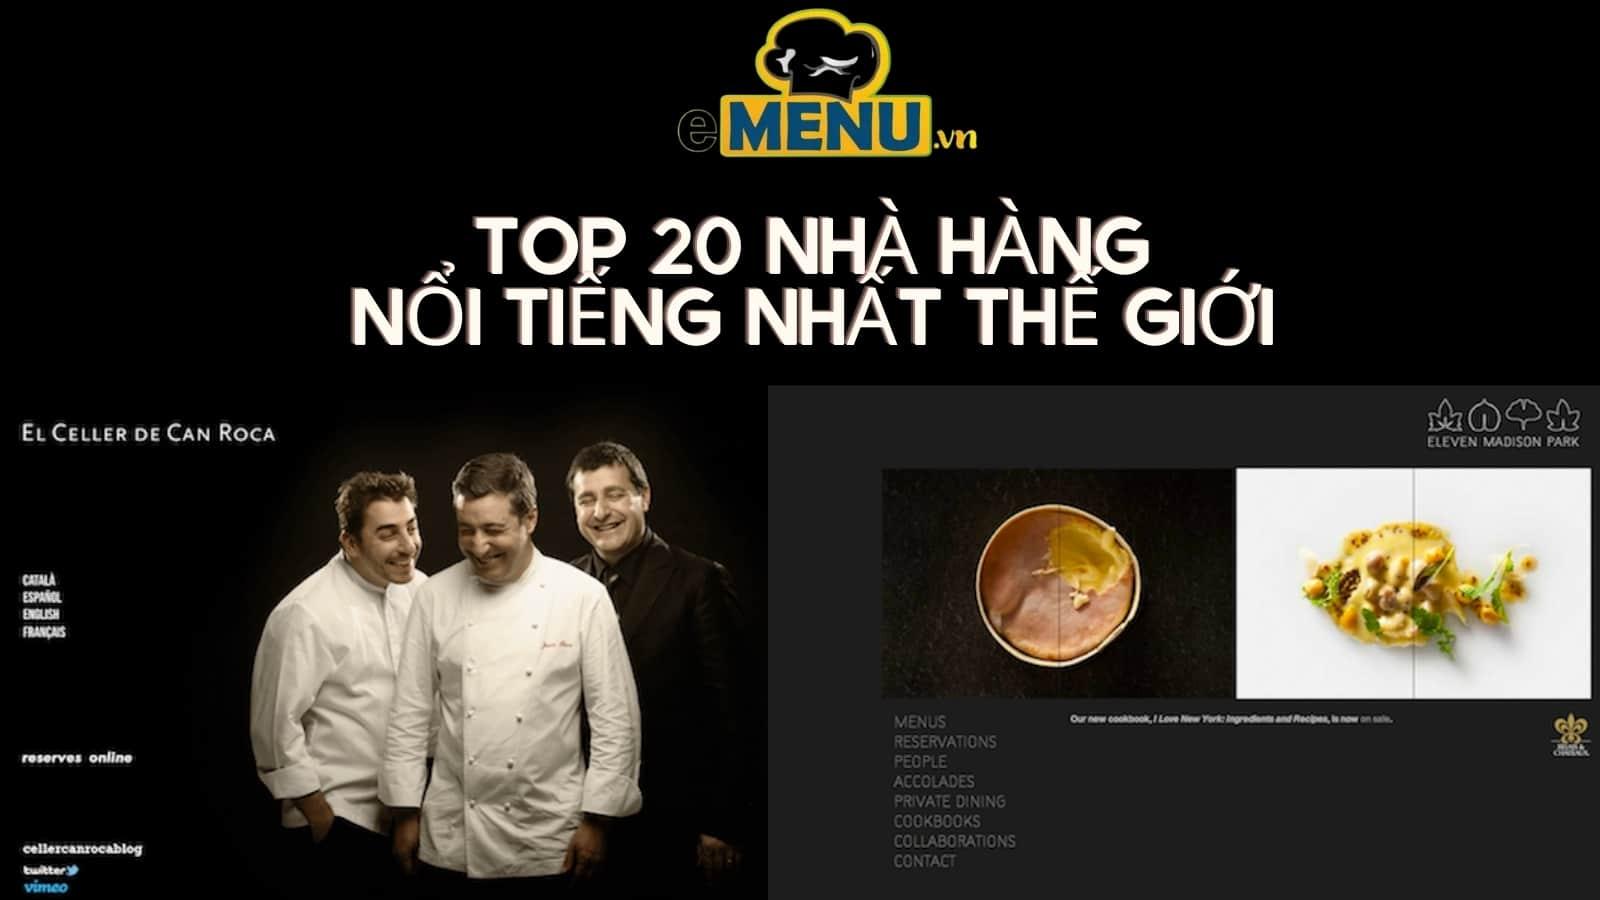 top 20 nha hang noi tieng nhat the gioi